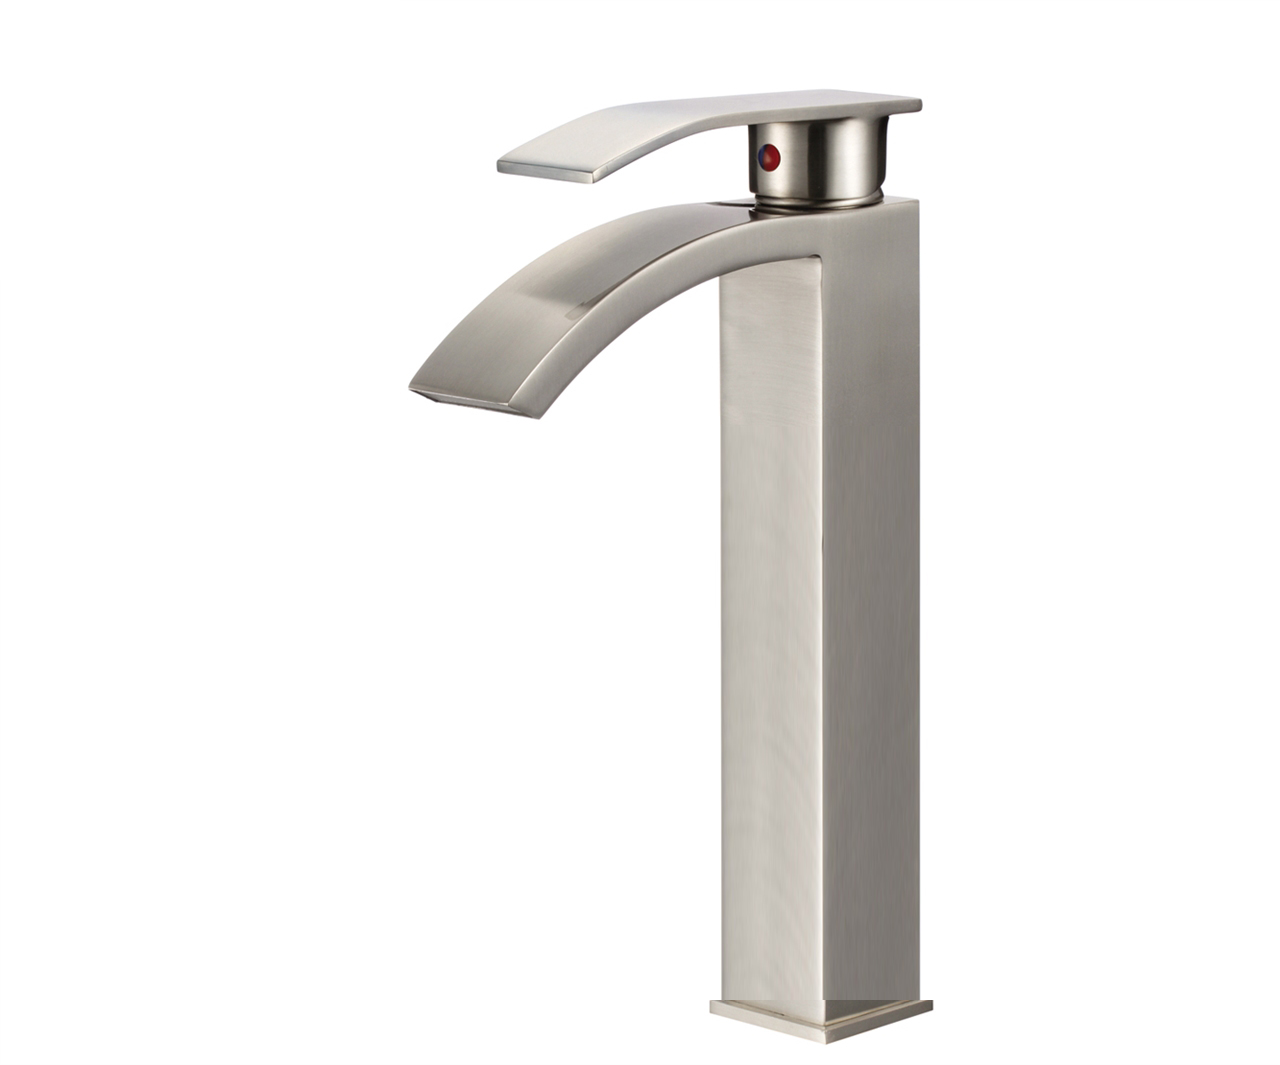 Genoa Single Handle Deck Mounted Bathroom Sink Faucet